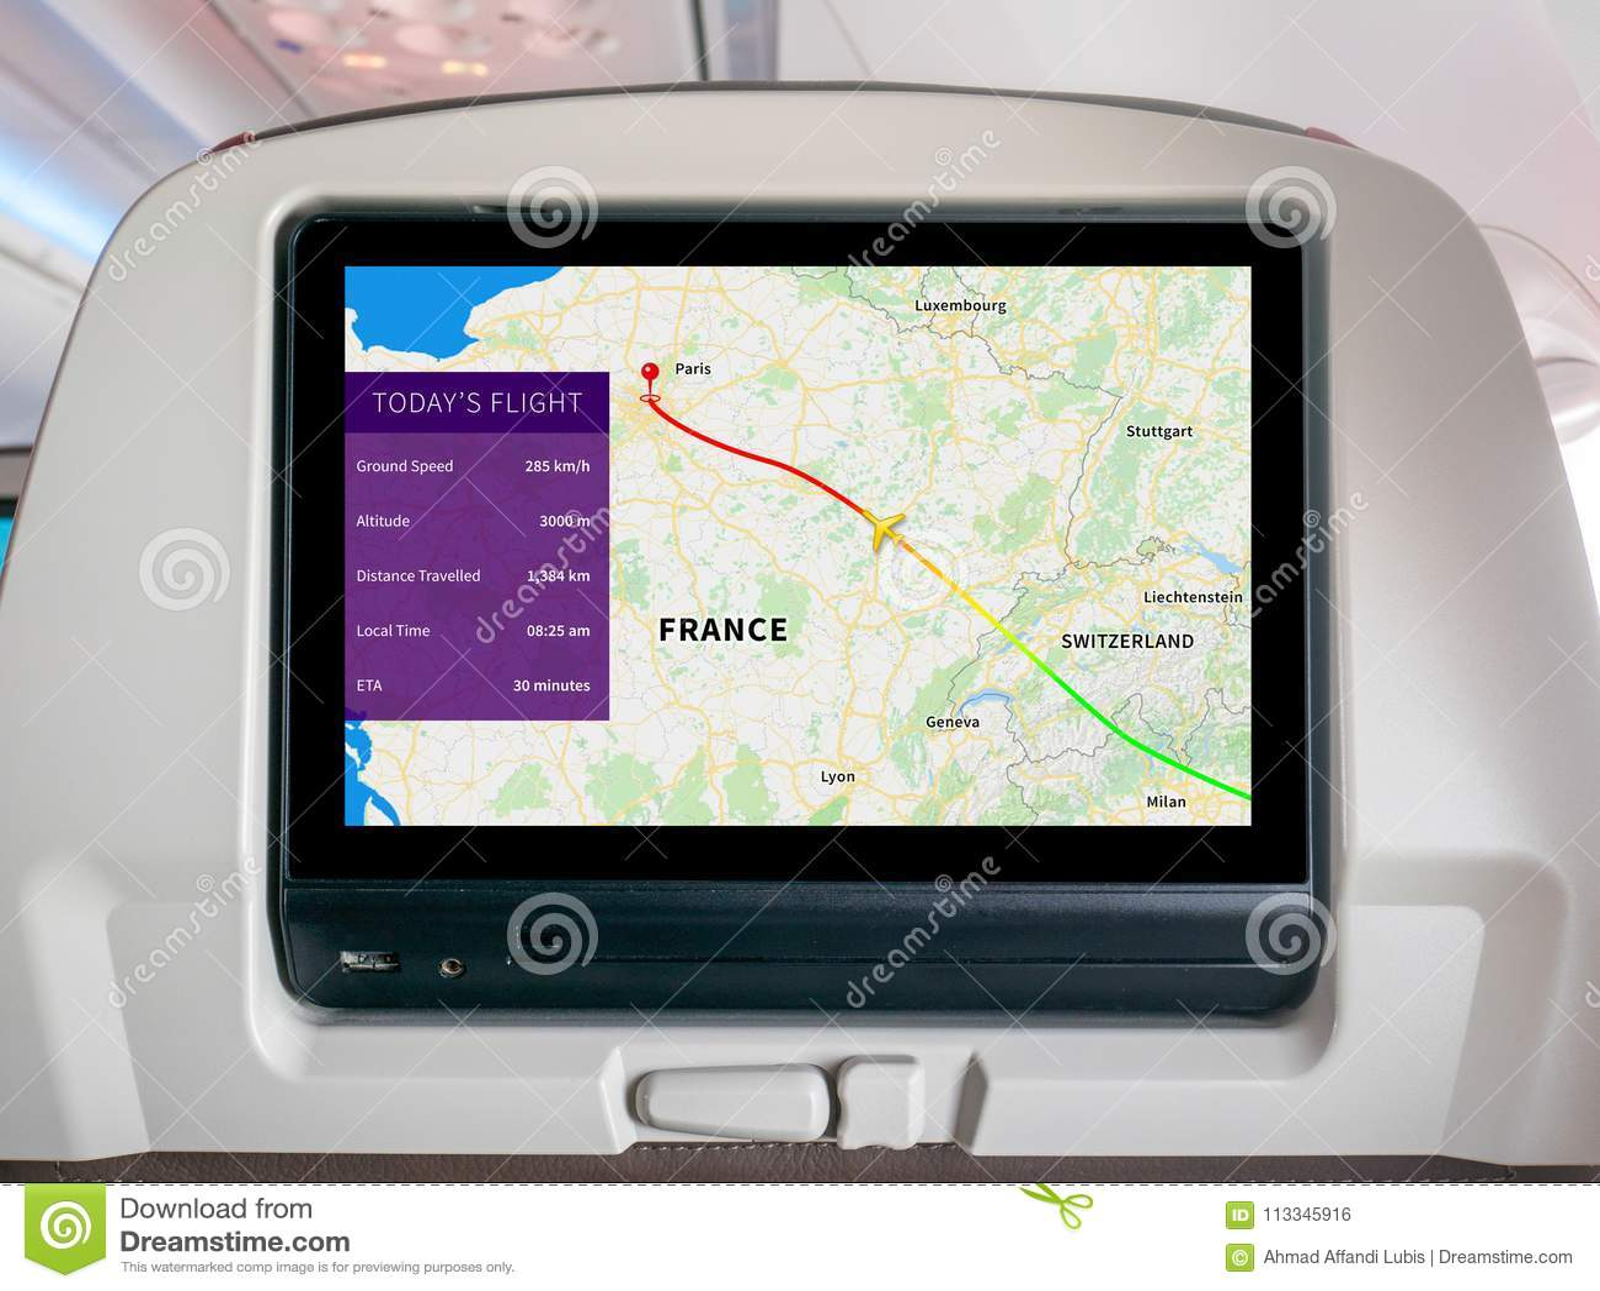 Inflight Progress Map Screen, In-Flight Map Screen, Flight Screen, Flight Tracker